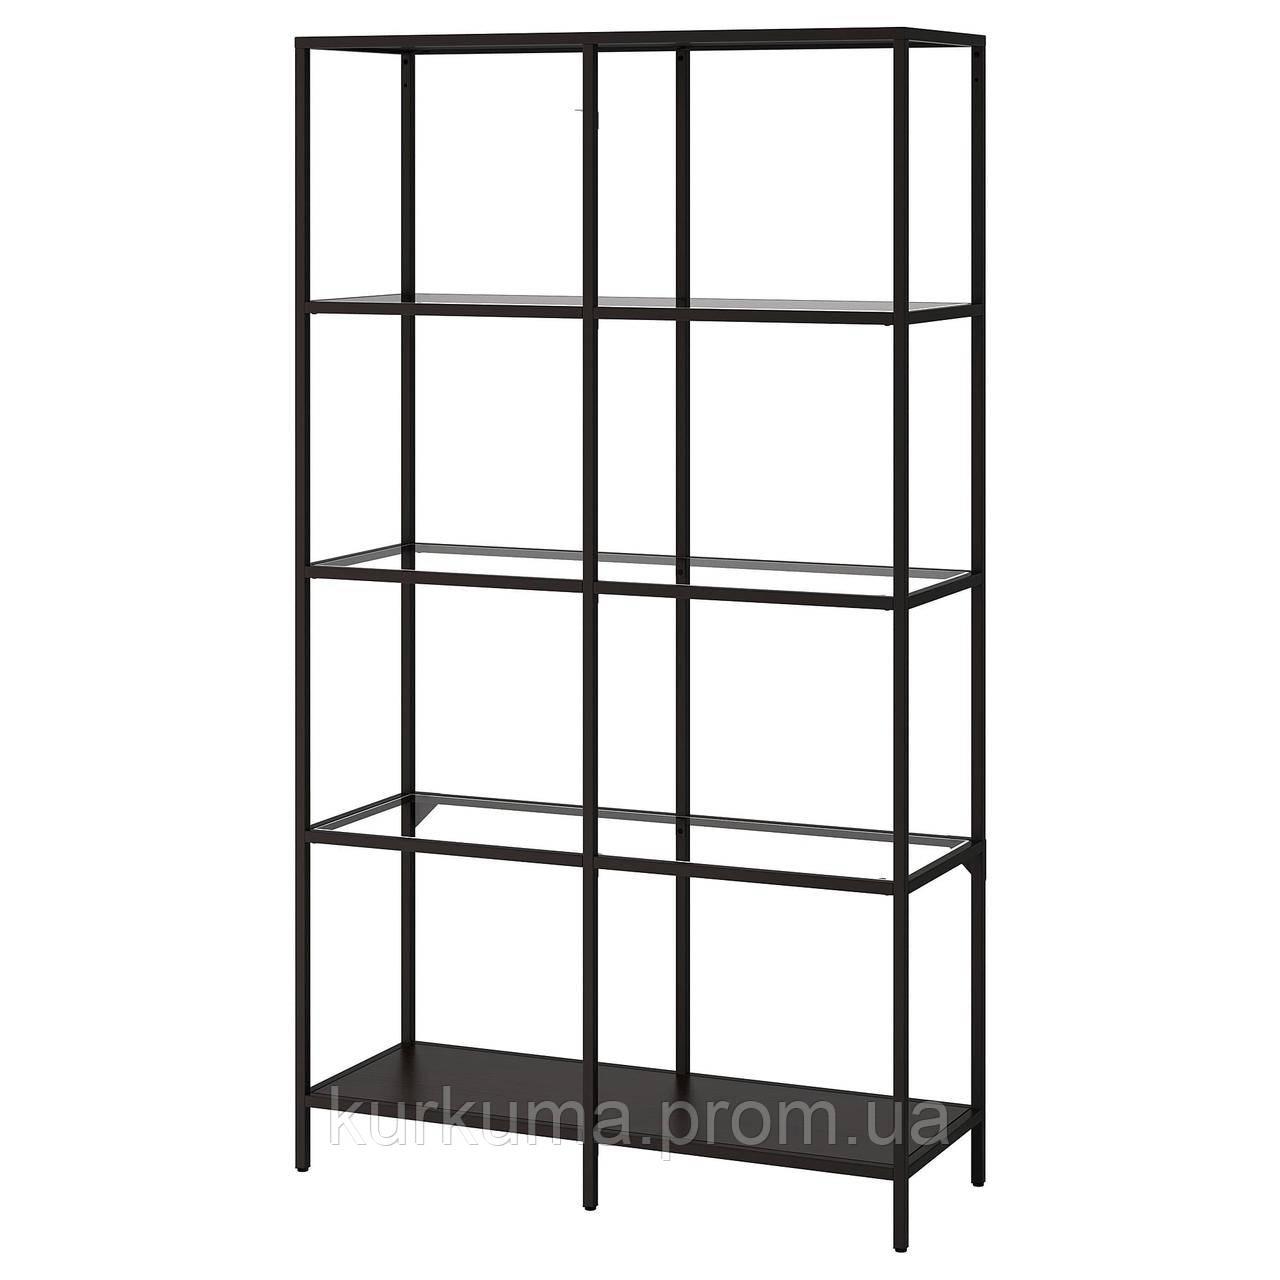 IKEA VITTSJO Стелаж, чорно-коричневий, скло (202.133.12)